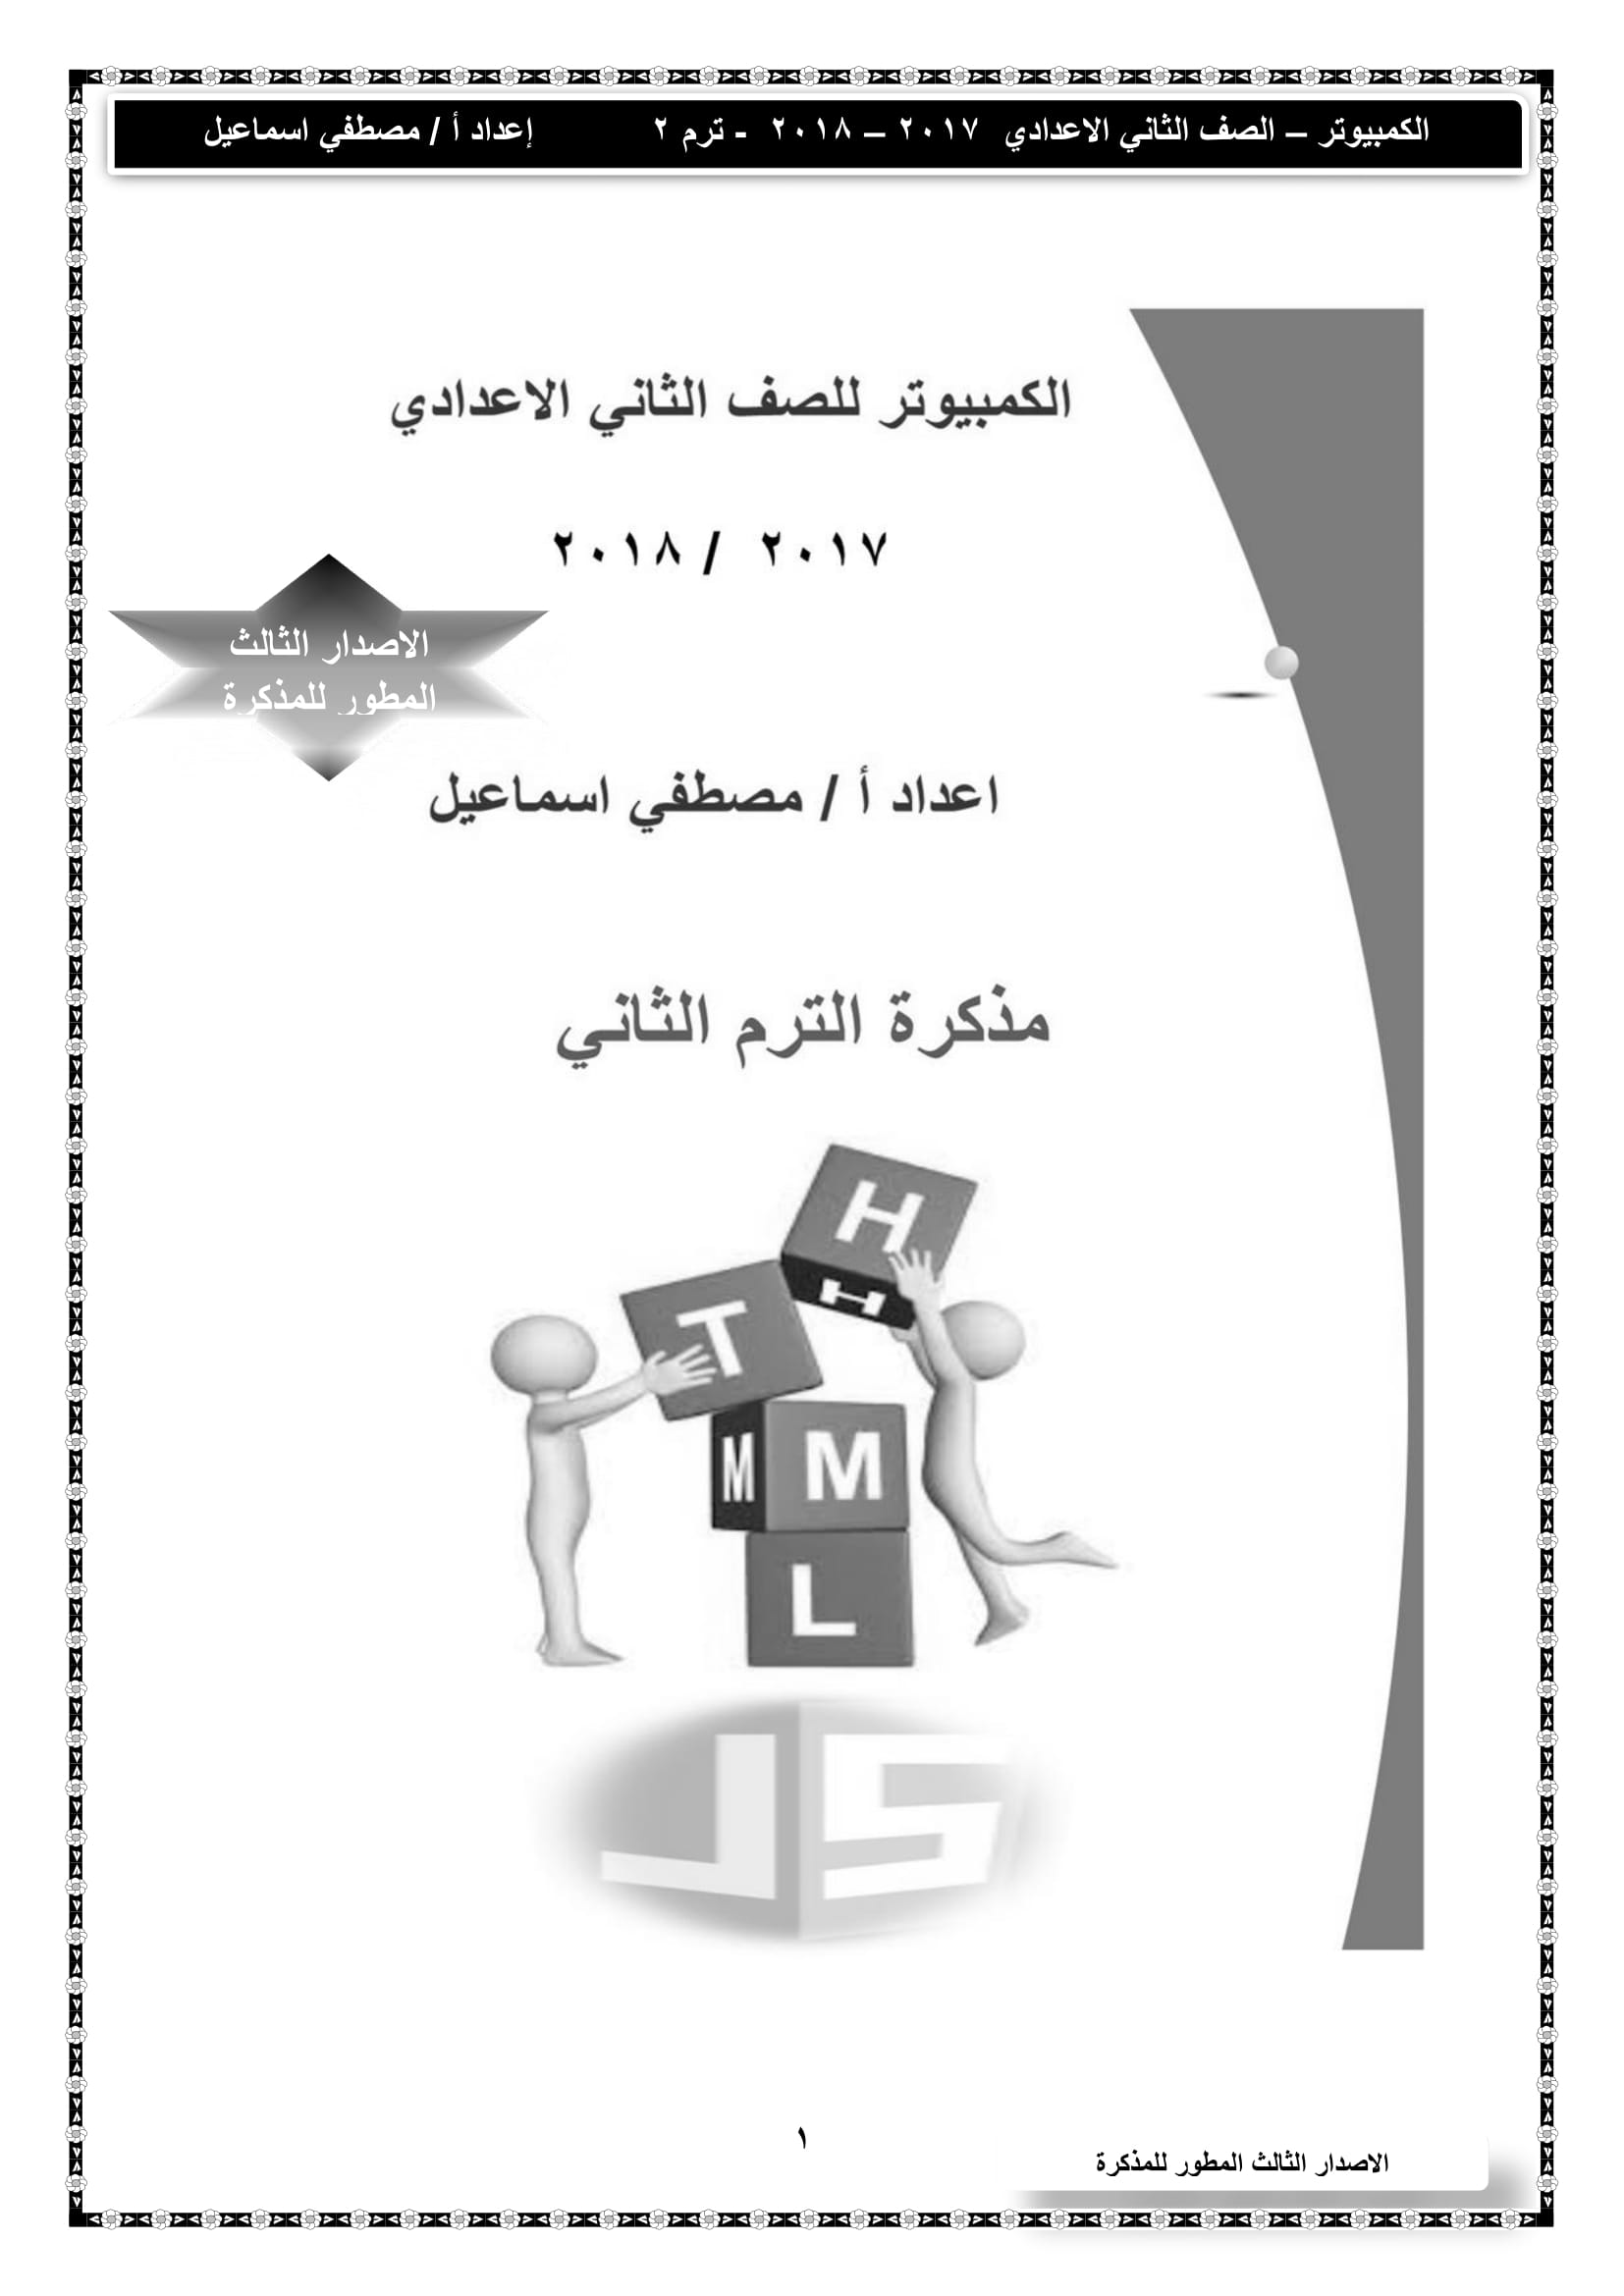 exam-eg.com_152441566721811.jpg